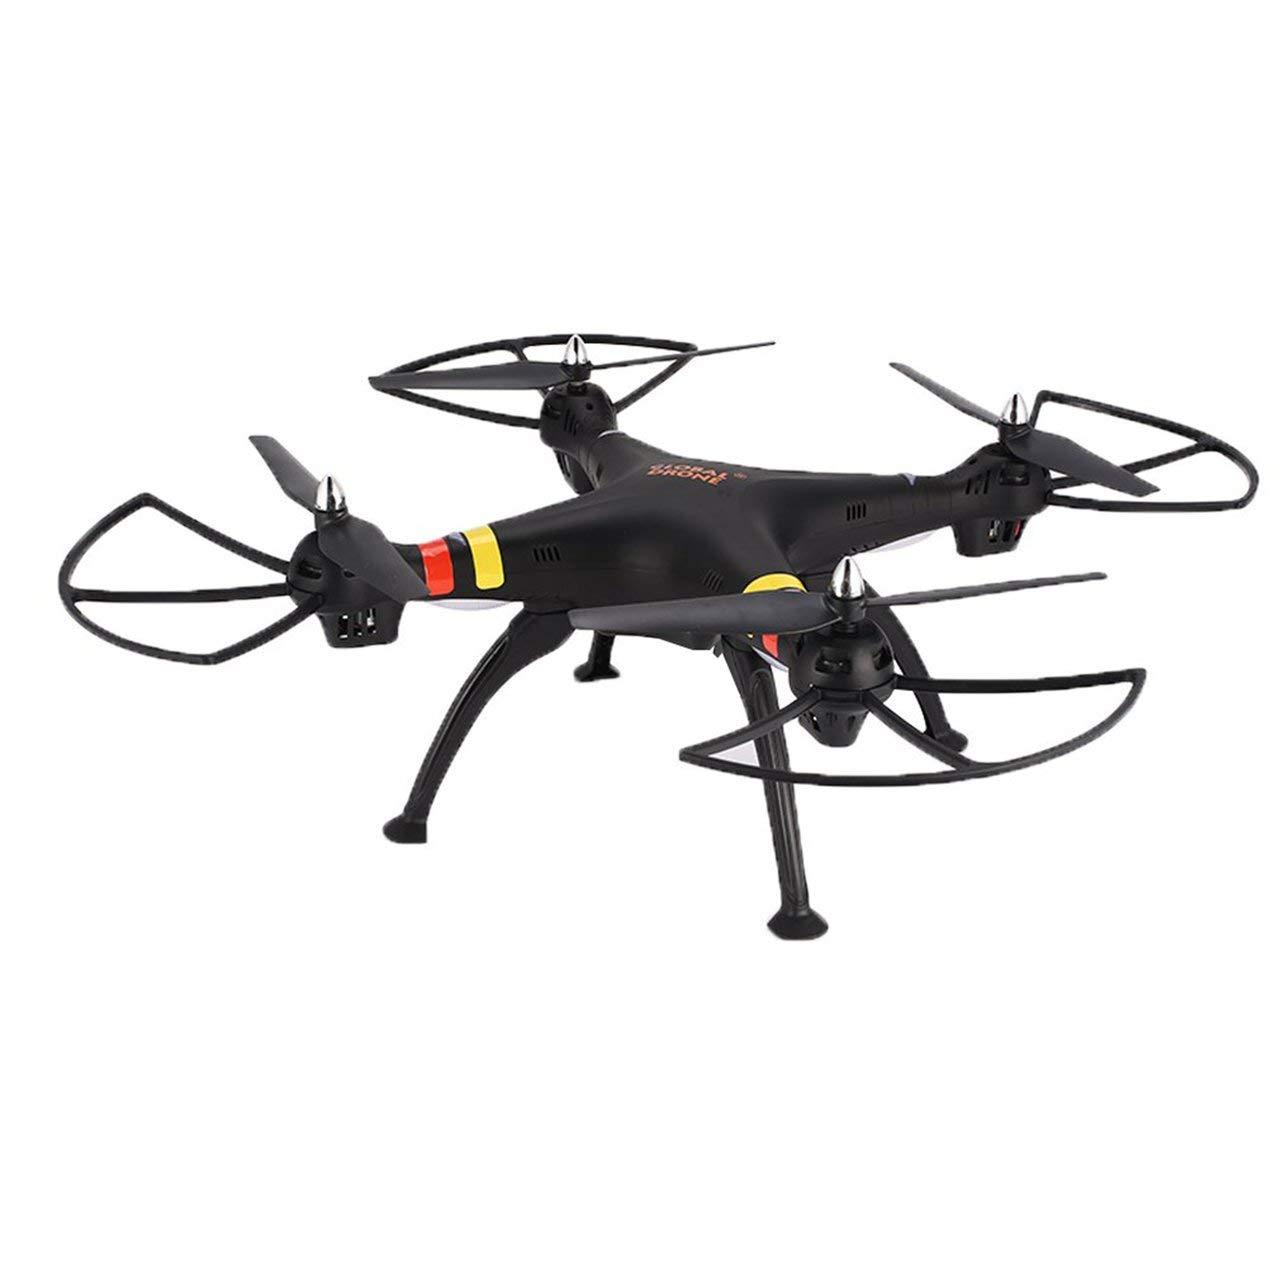 Jasnyfall GLOBAL Drone GW180 2.4G Smart RC Quadcopter Drohne mit 3D-Flips Headless-Modus - Schwarz